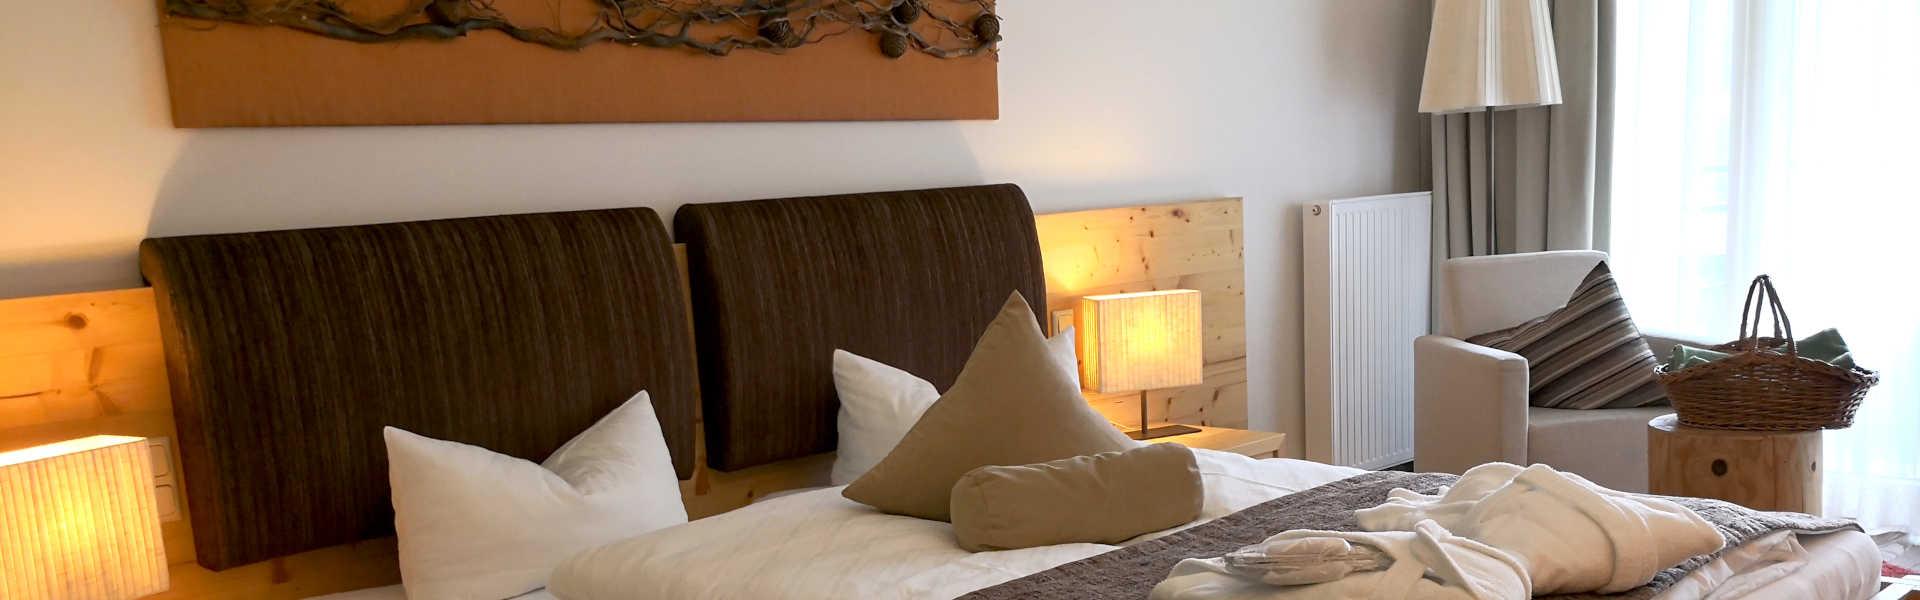 Zimmer - Doppelzimmer Zedern Klang - Headerbild